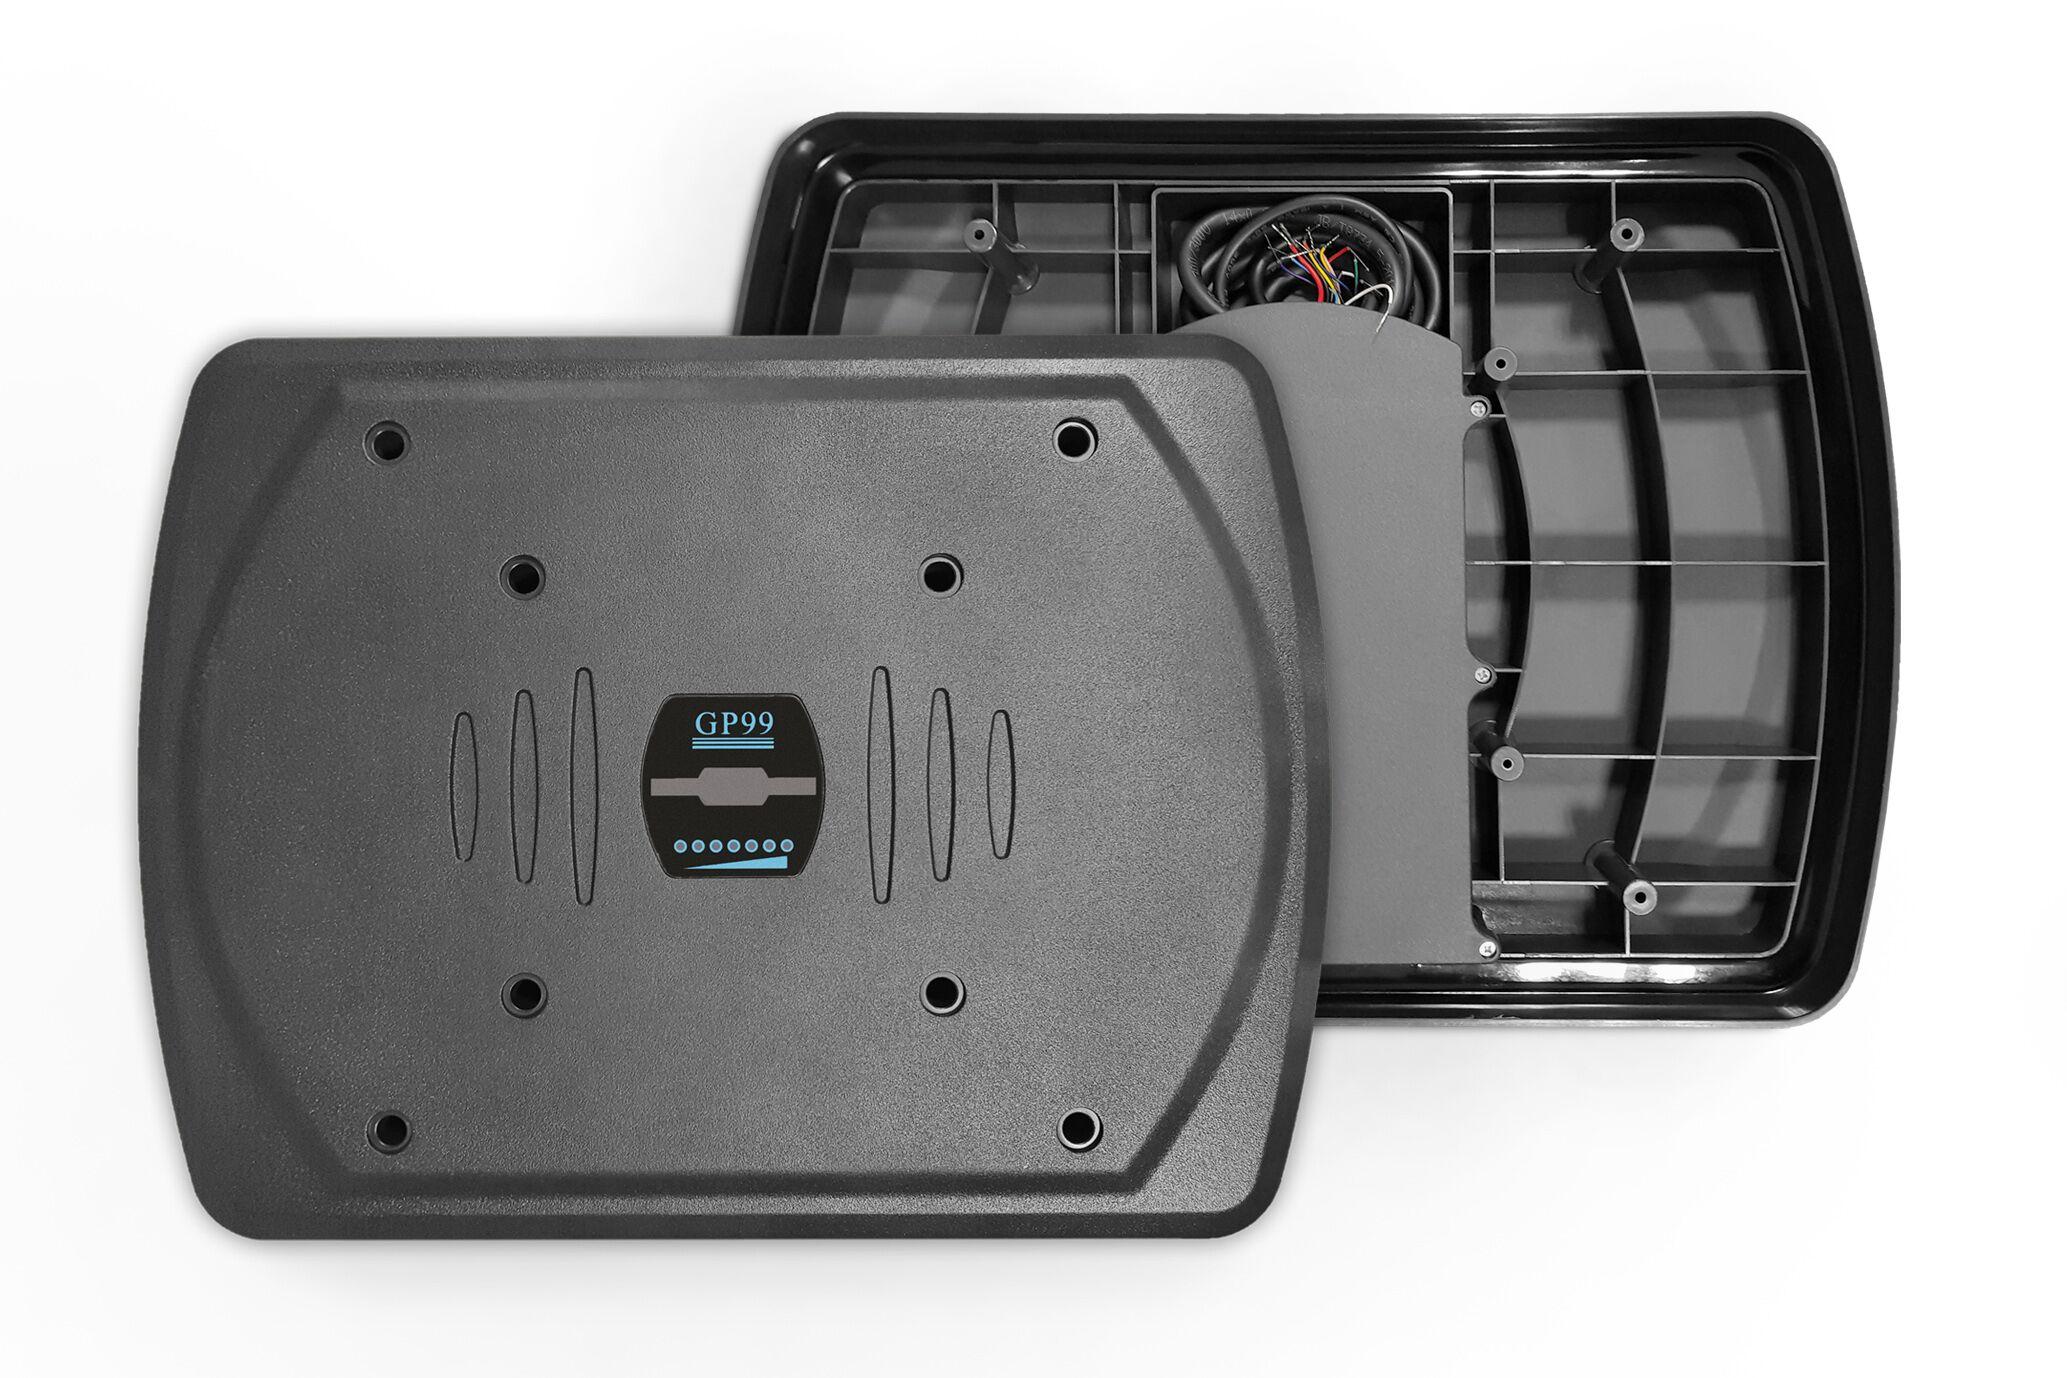 GP99 Proximity RFID Reader